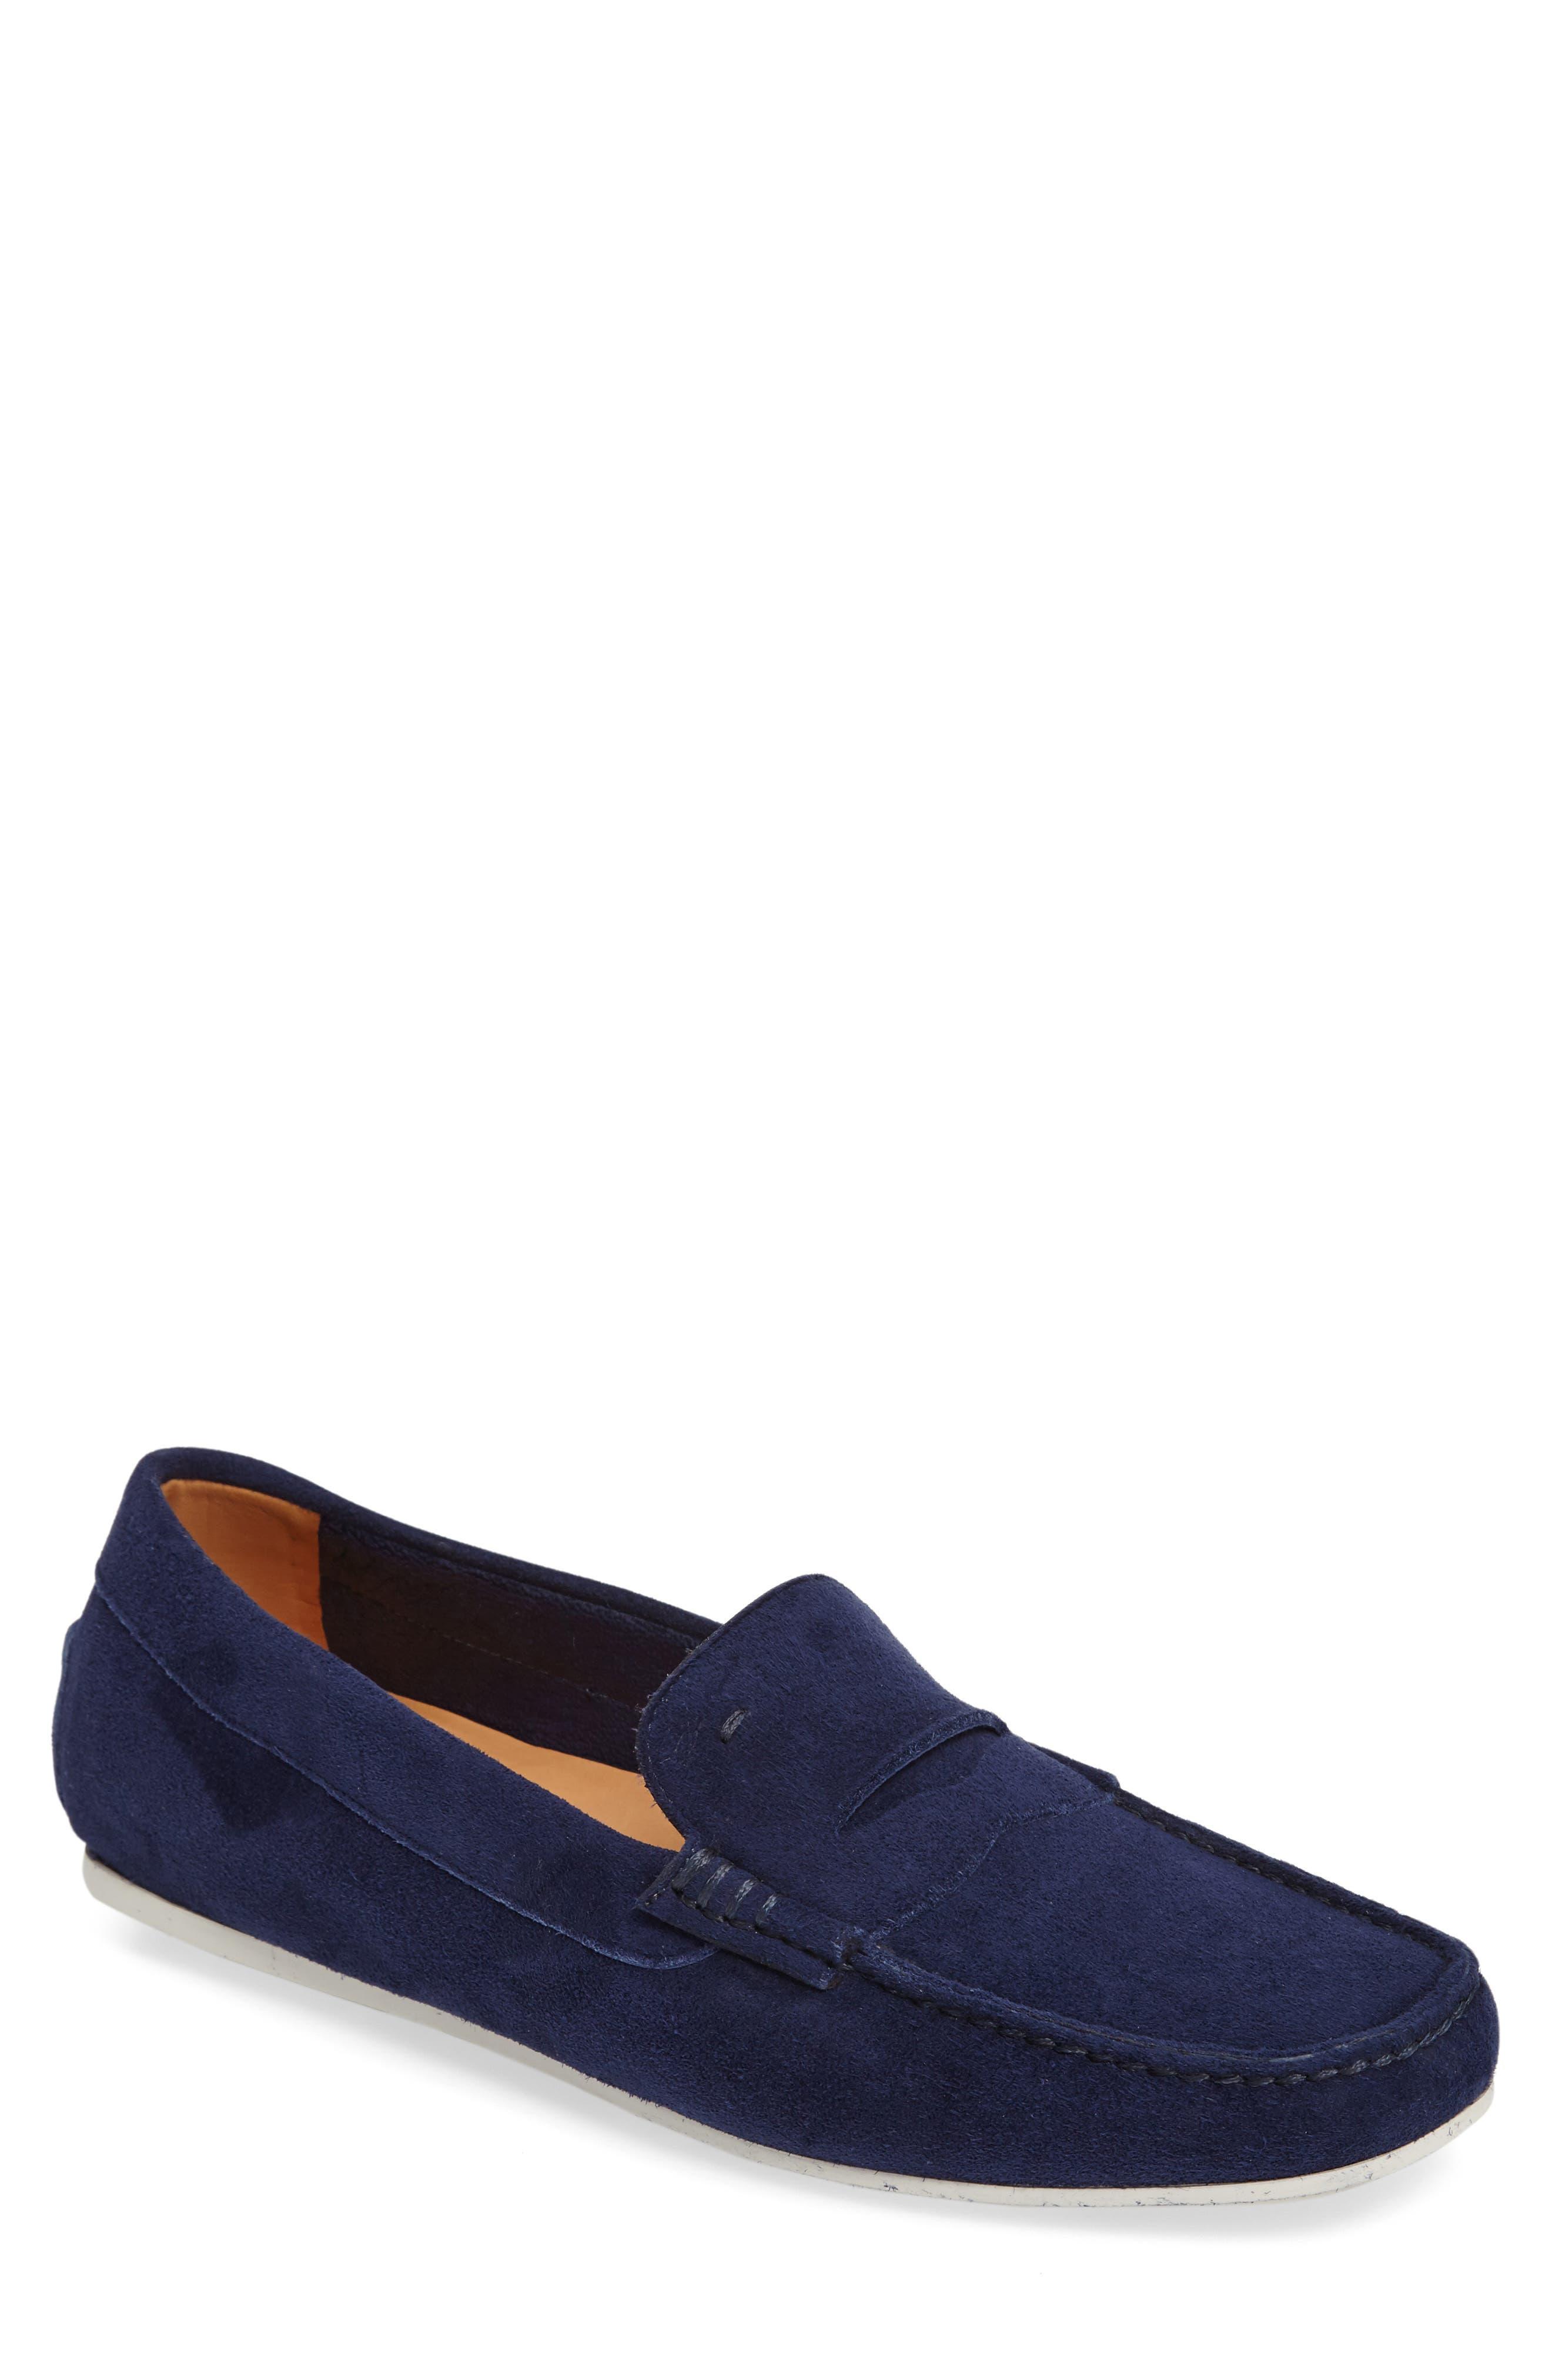 Santoni Shoes   Nordstrom